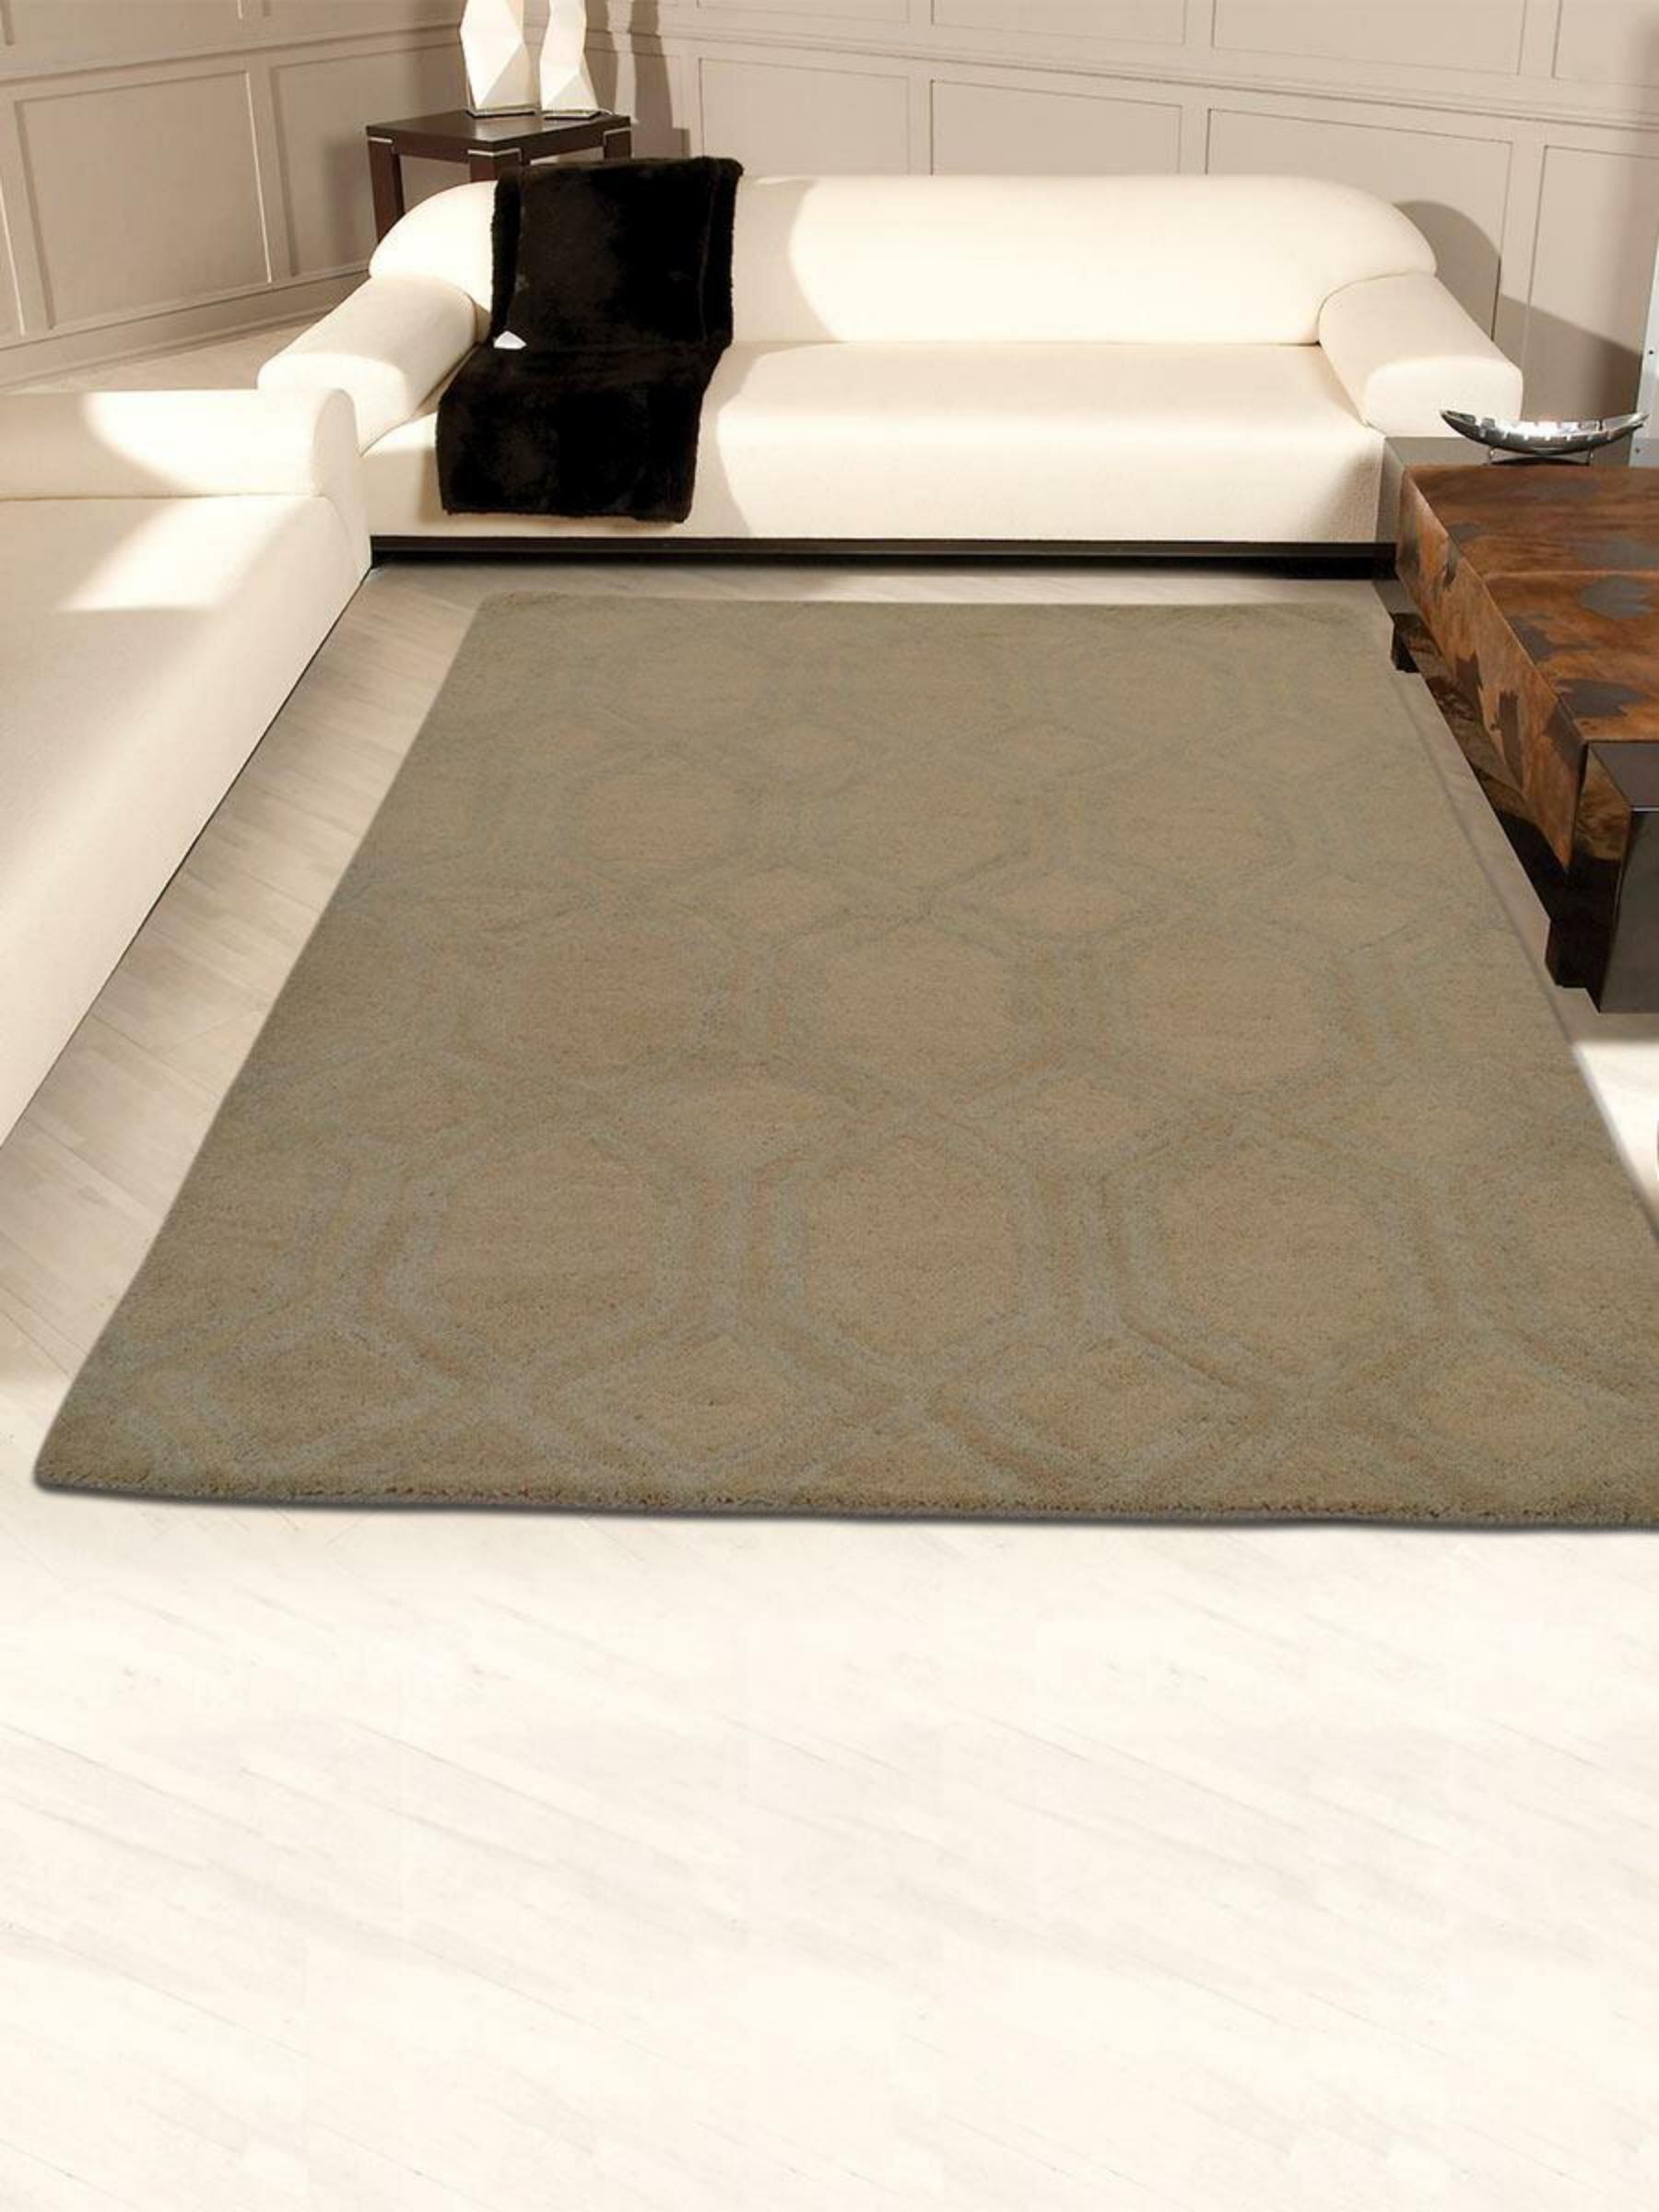 Bay Isle Home Mcarthur Geometric Handmade Tufted Wool Beige Area Rug Wayfair